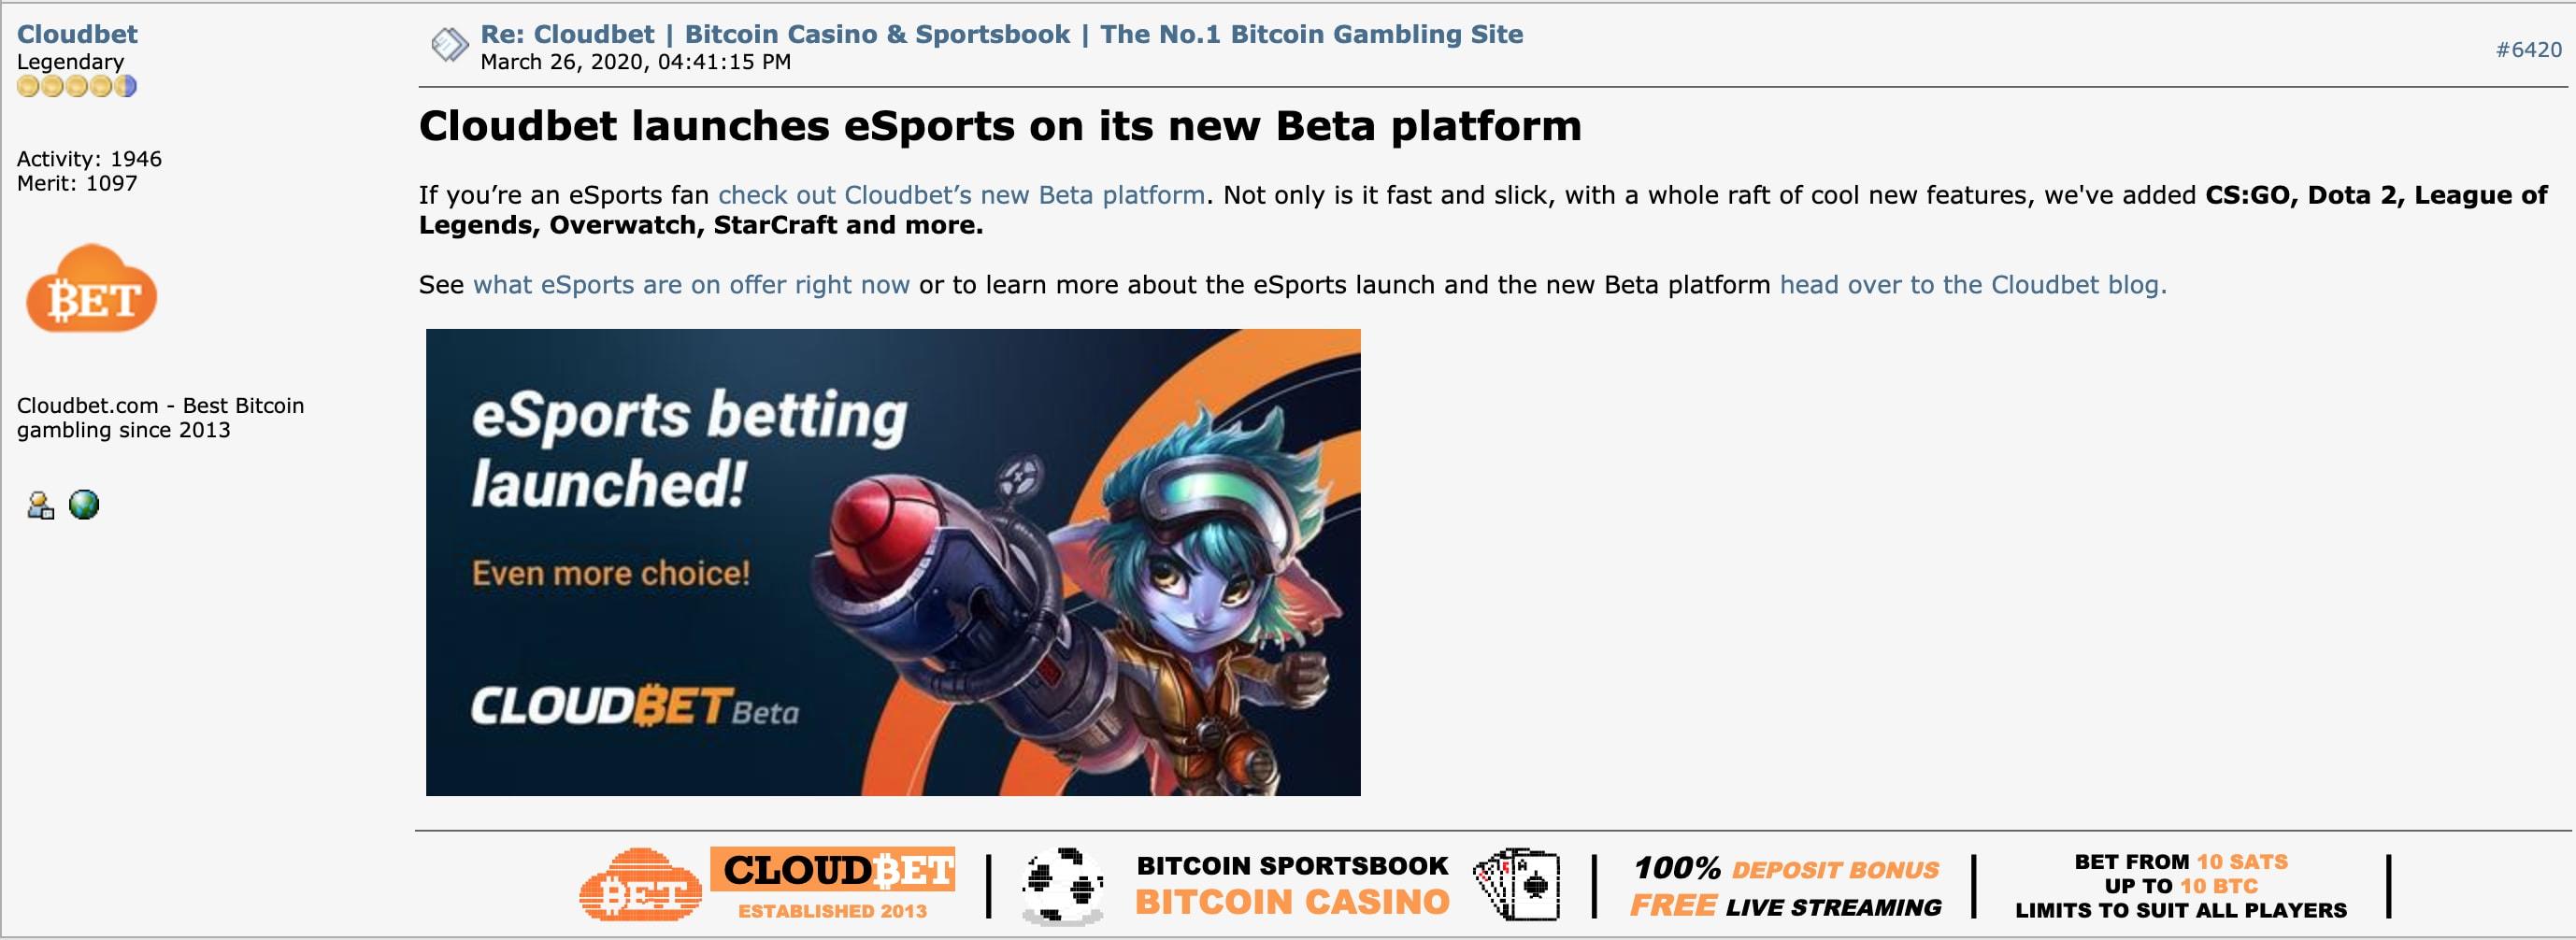 Cloudbet's Bitcoin Talk Avatar & Signature